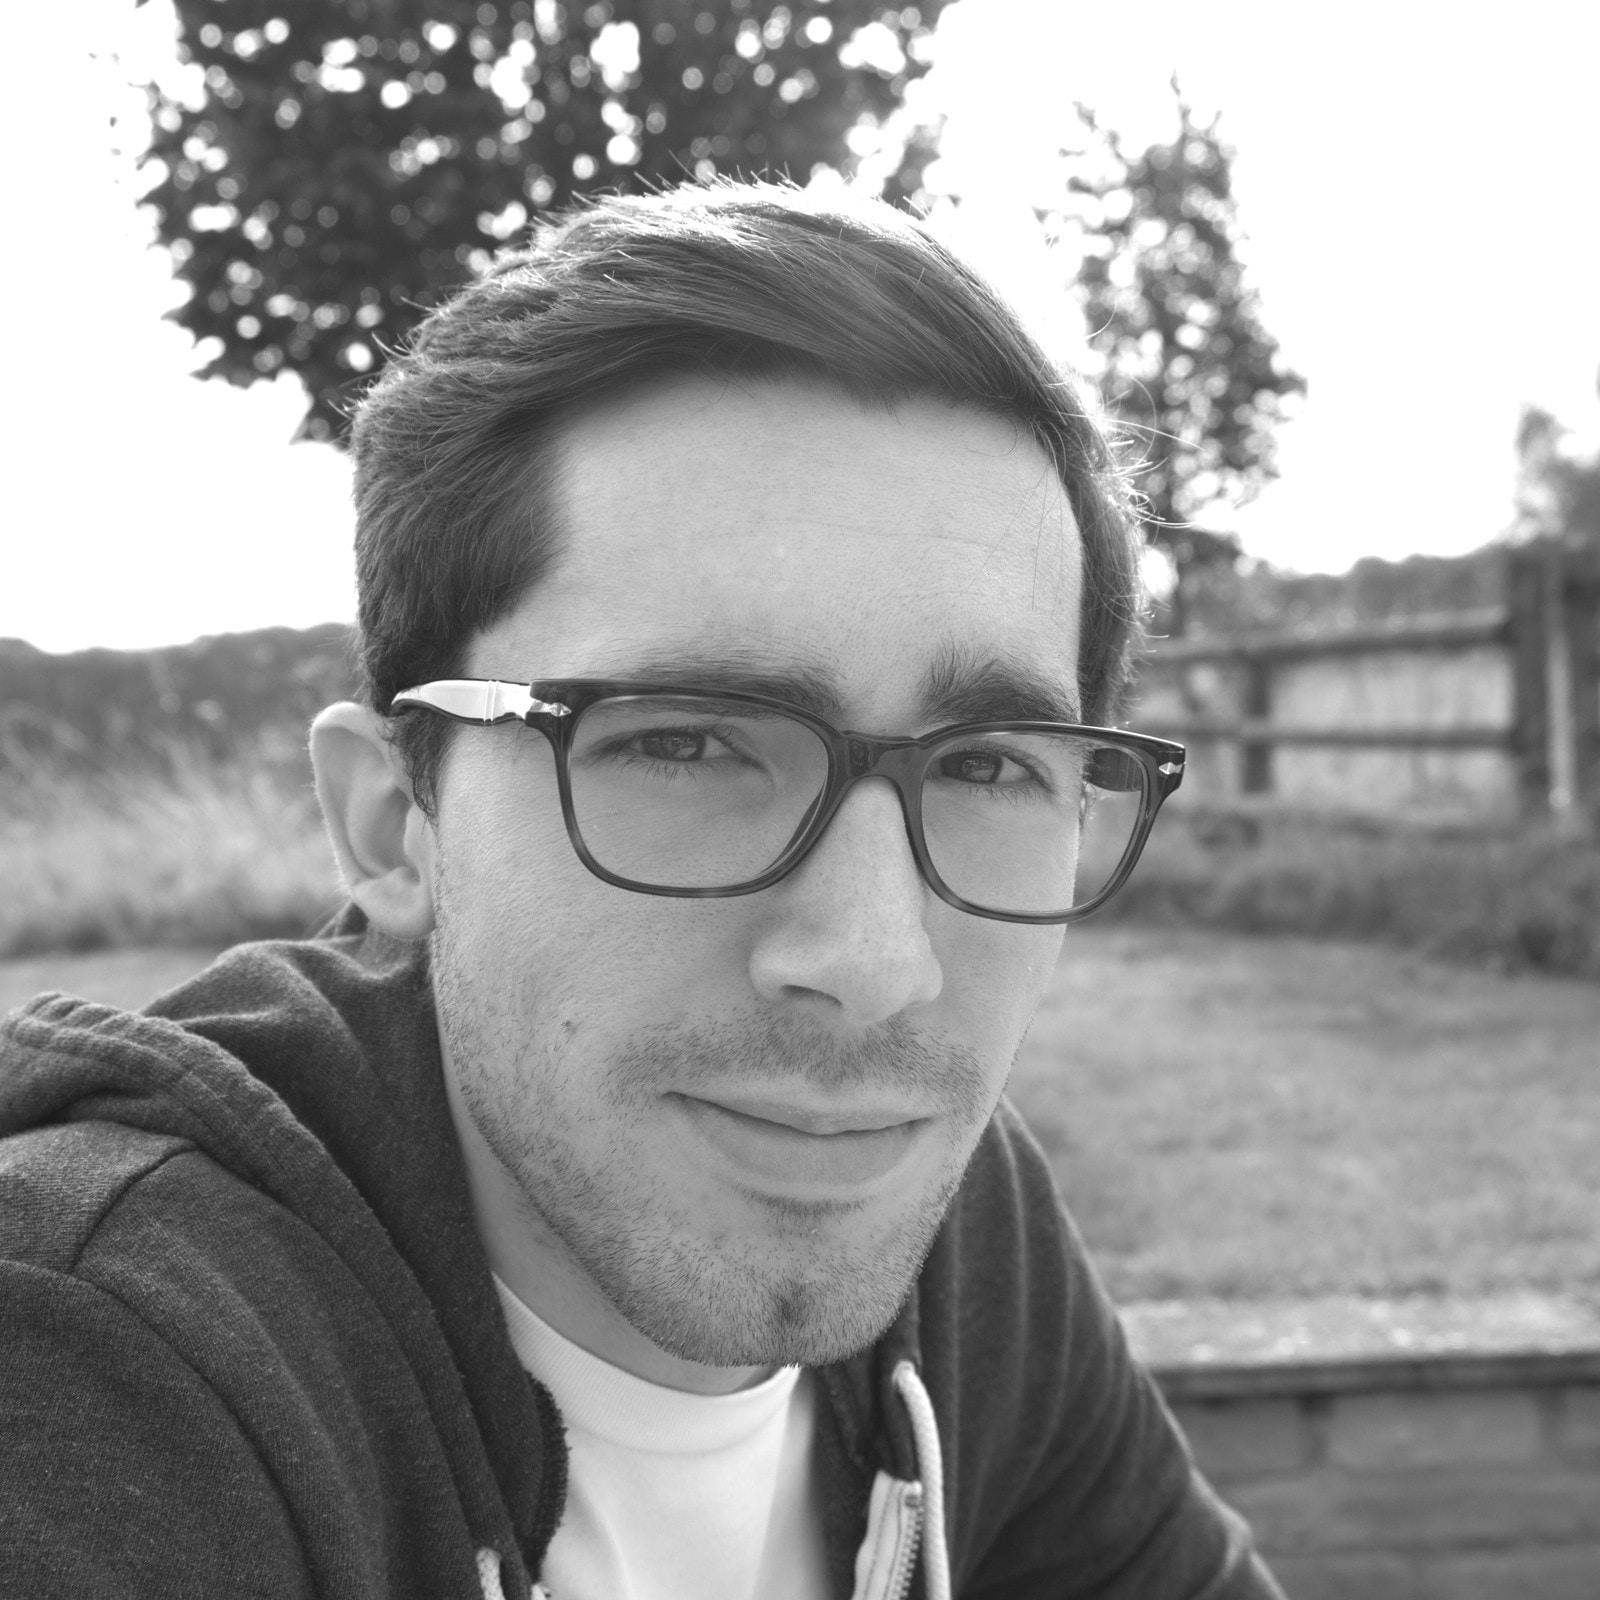 Avatar of user Joe Green